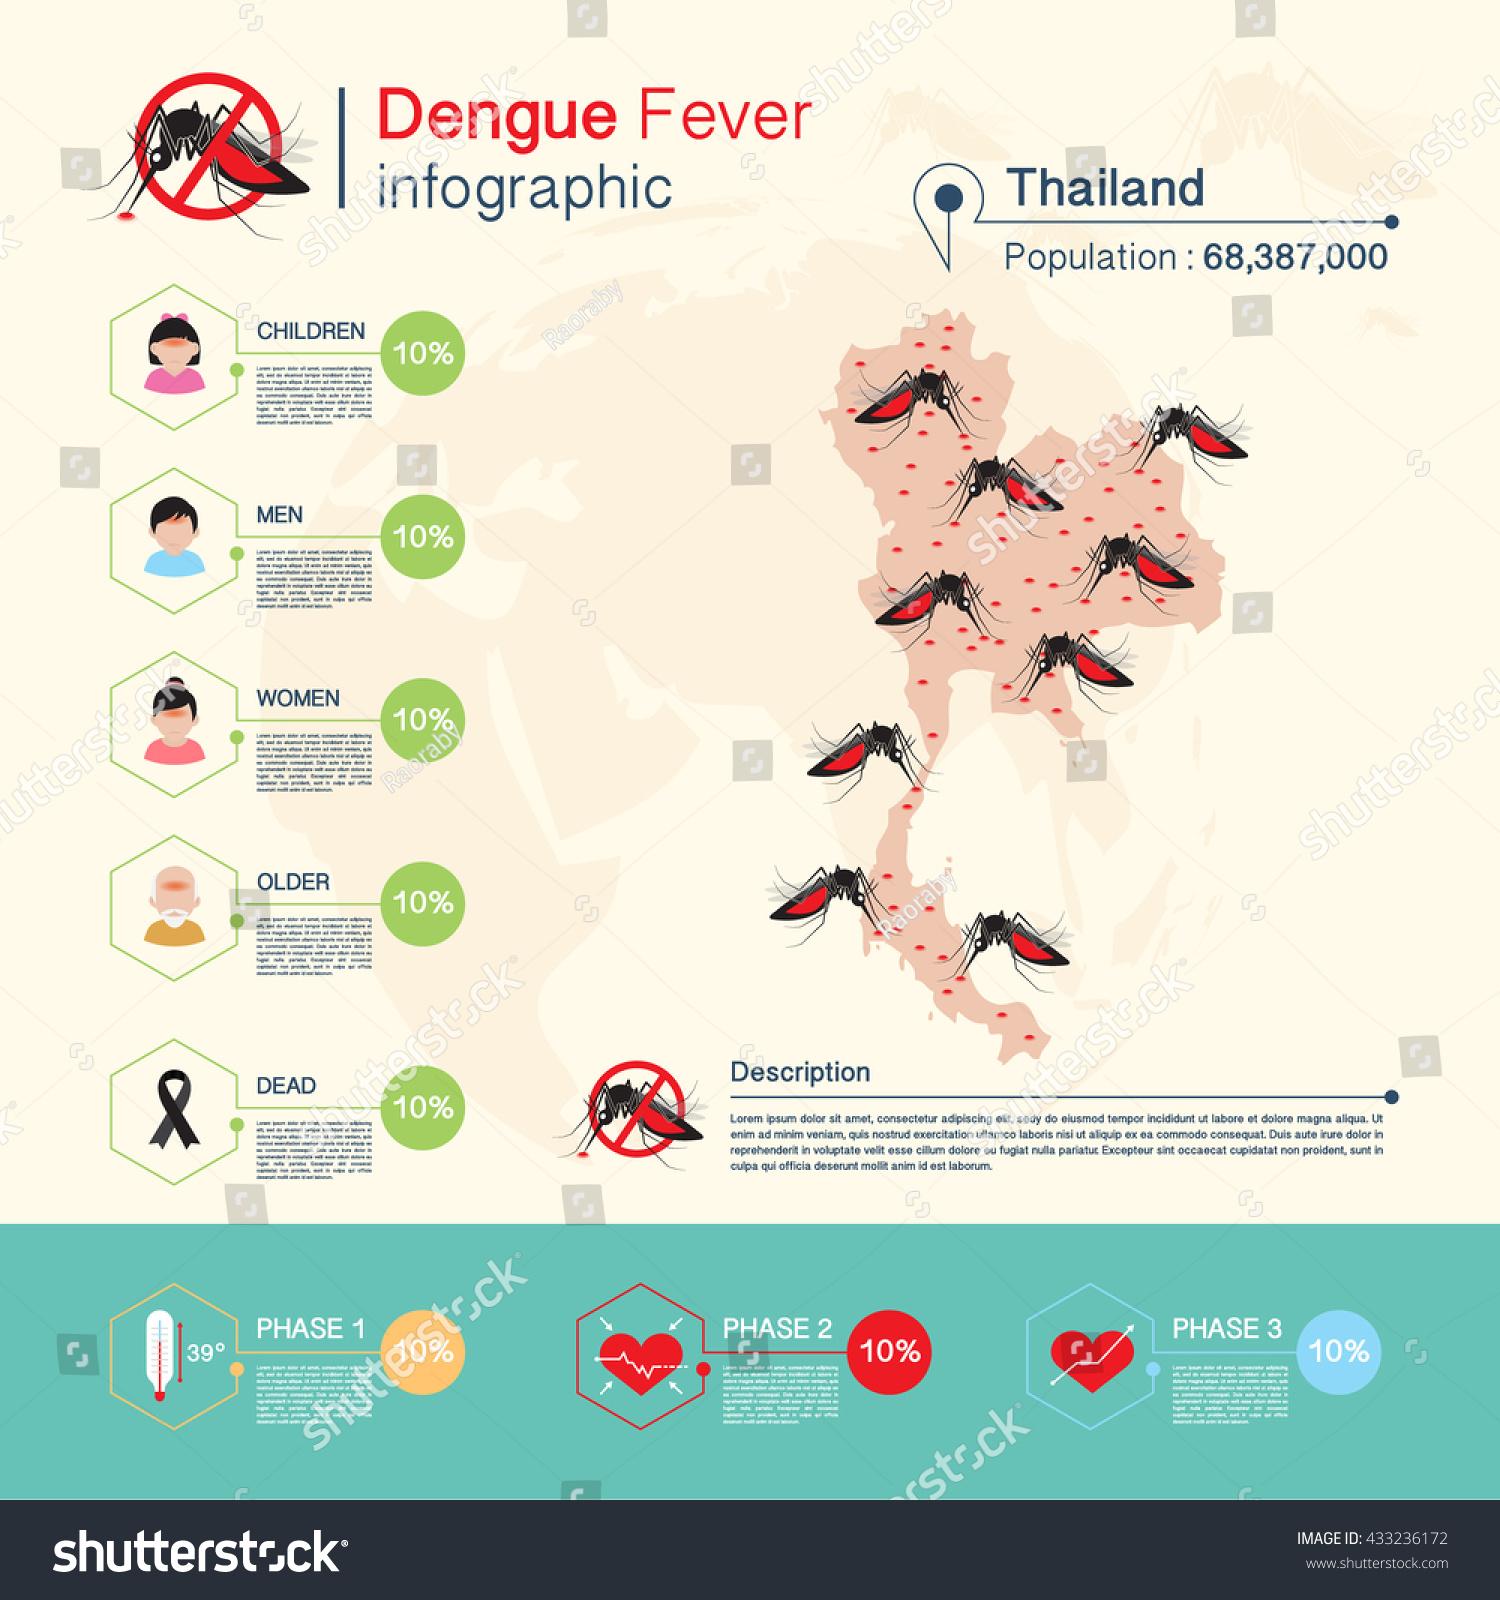 denguefeber thailand